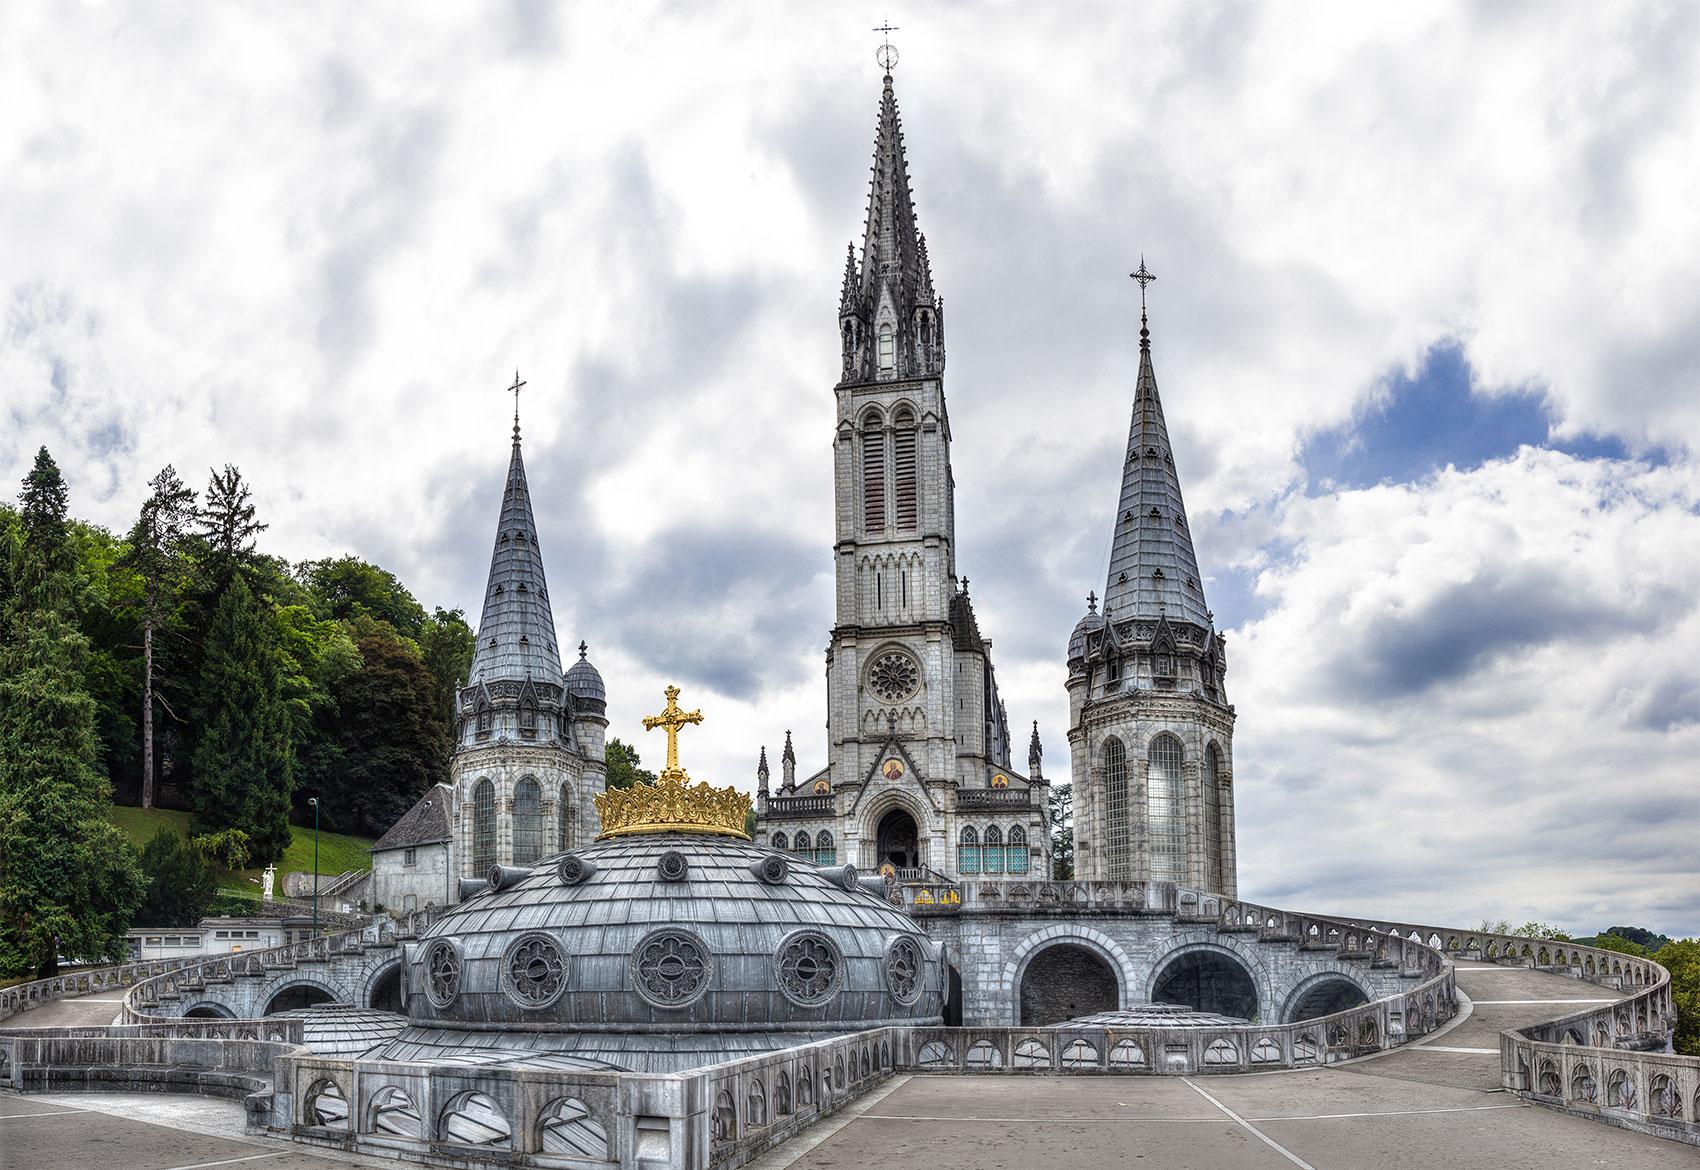 https://bsl.com.mt/wp-content/uploads/2021/04/Lourdes.jpg